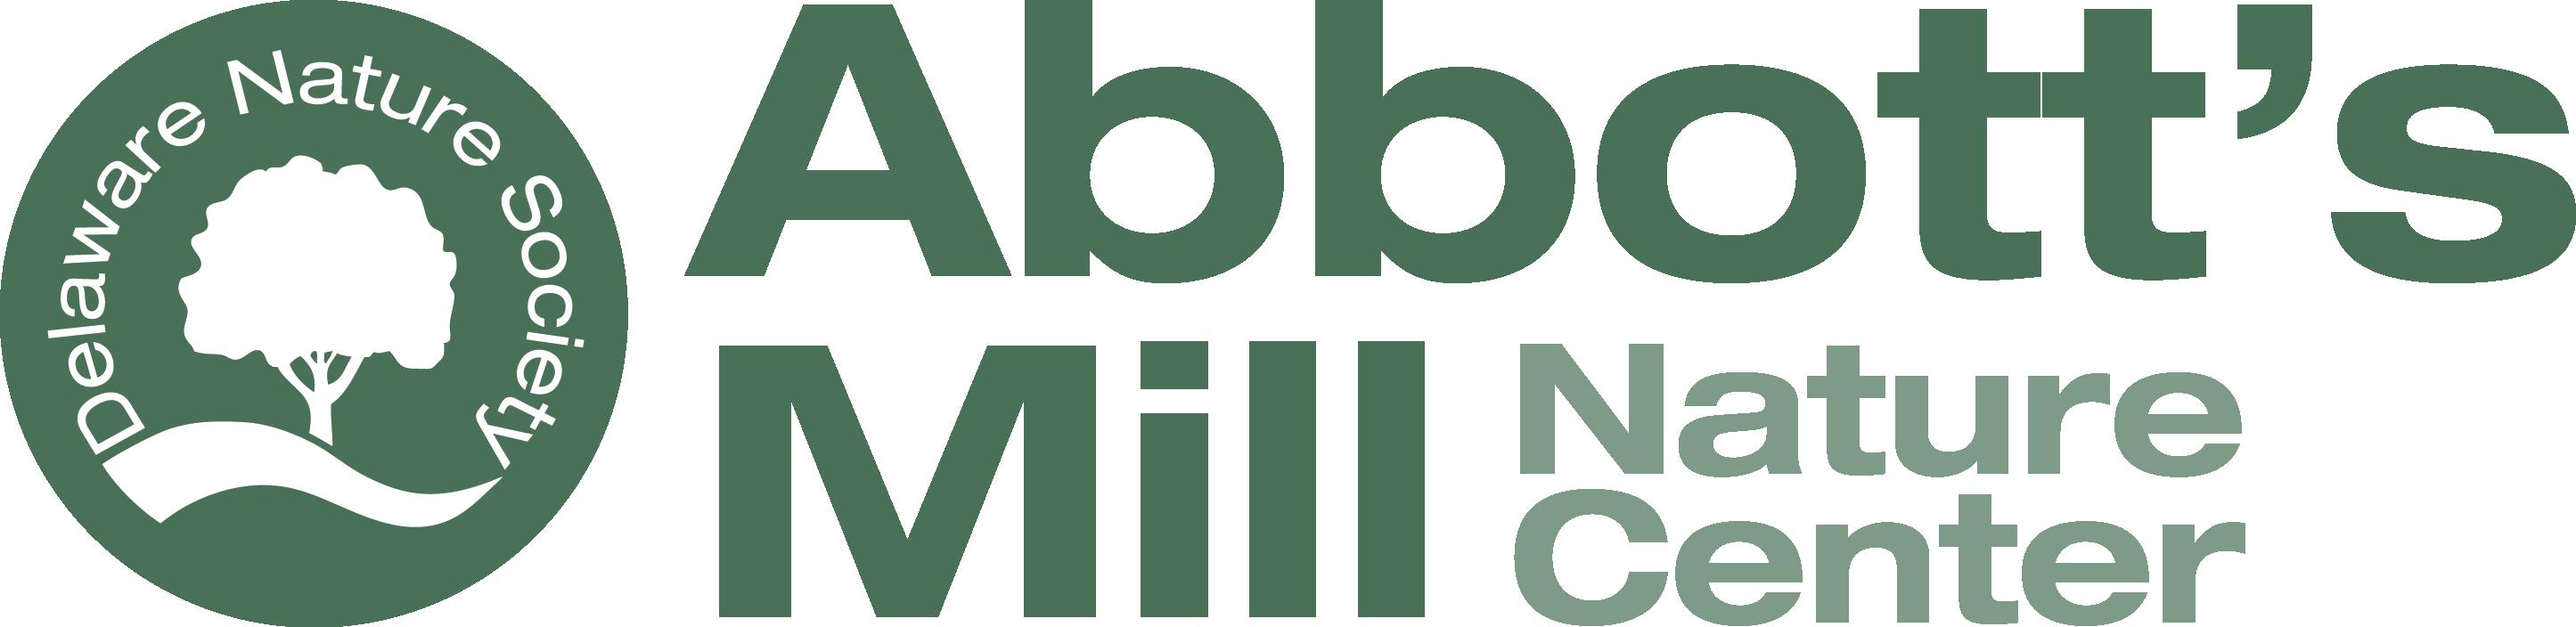 Abbotts-logo-wide-outlines.png